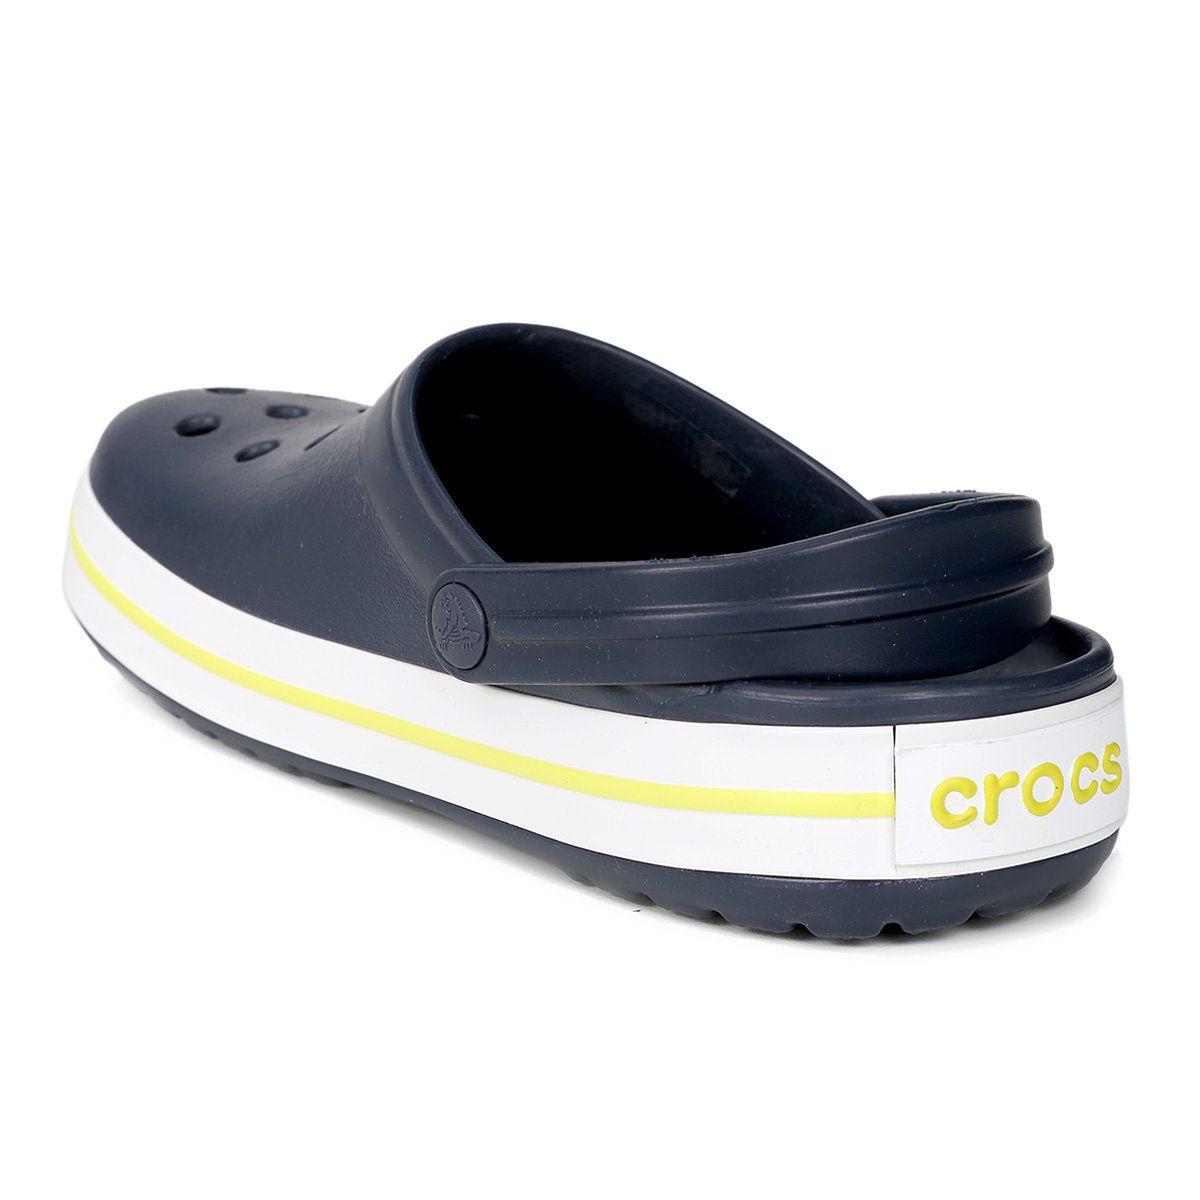 Sandália Crocs Crocband Infantil Navy/Citrus